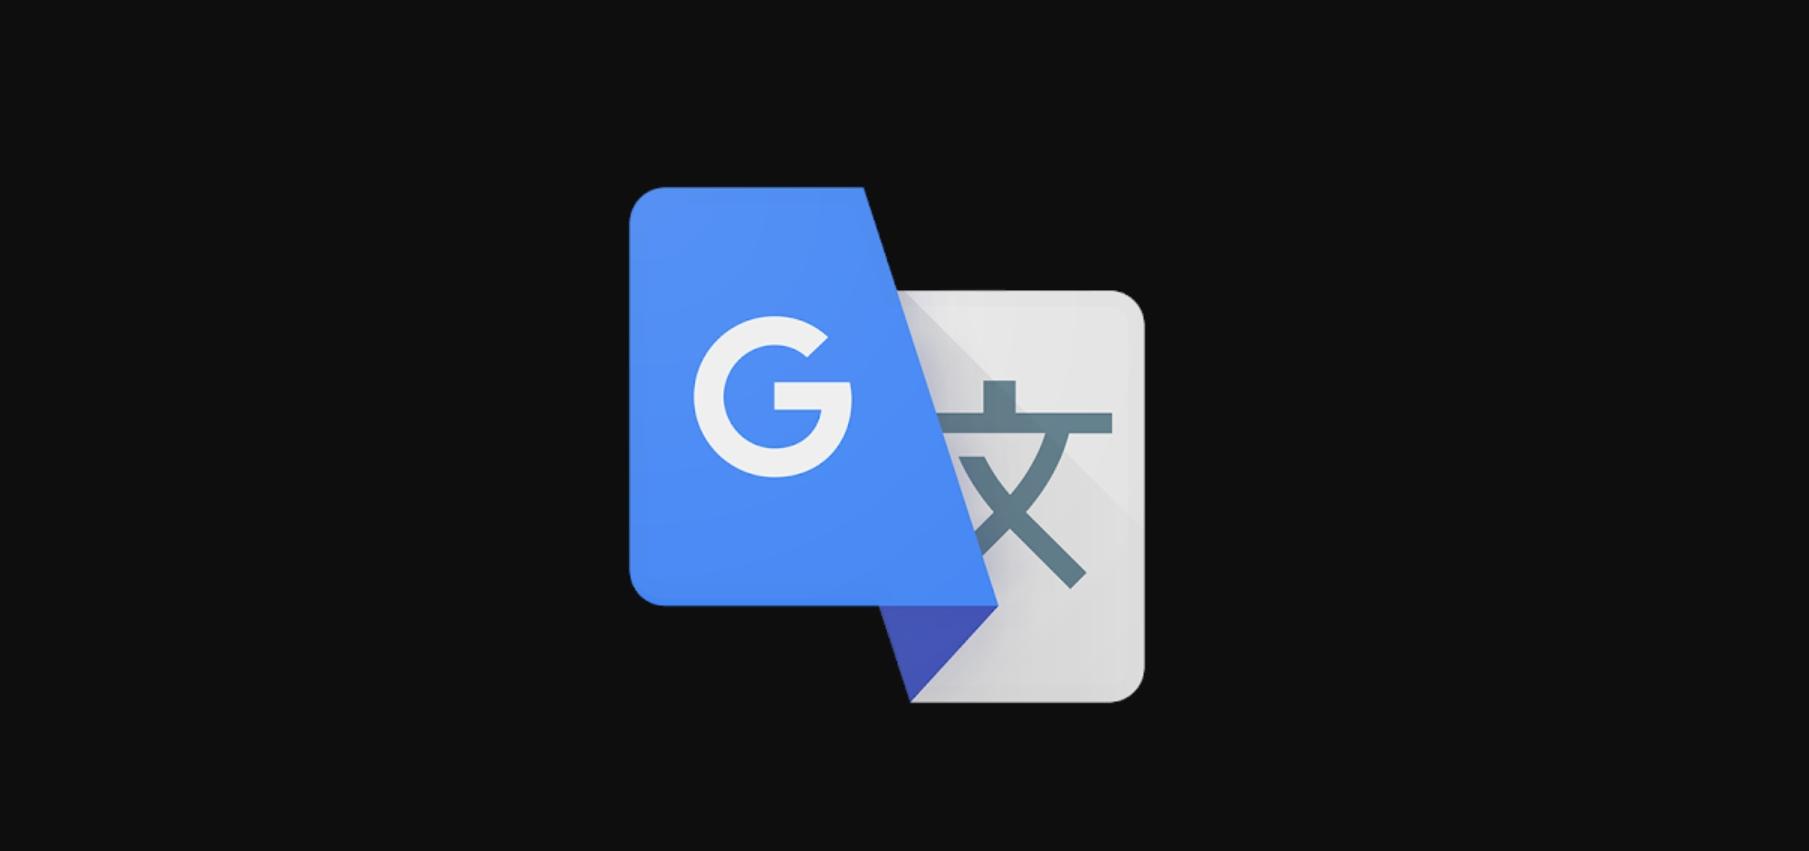 Google Překladač dostává plnohodnotný tmavý vzhled [aktualizováno]